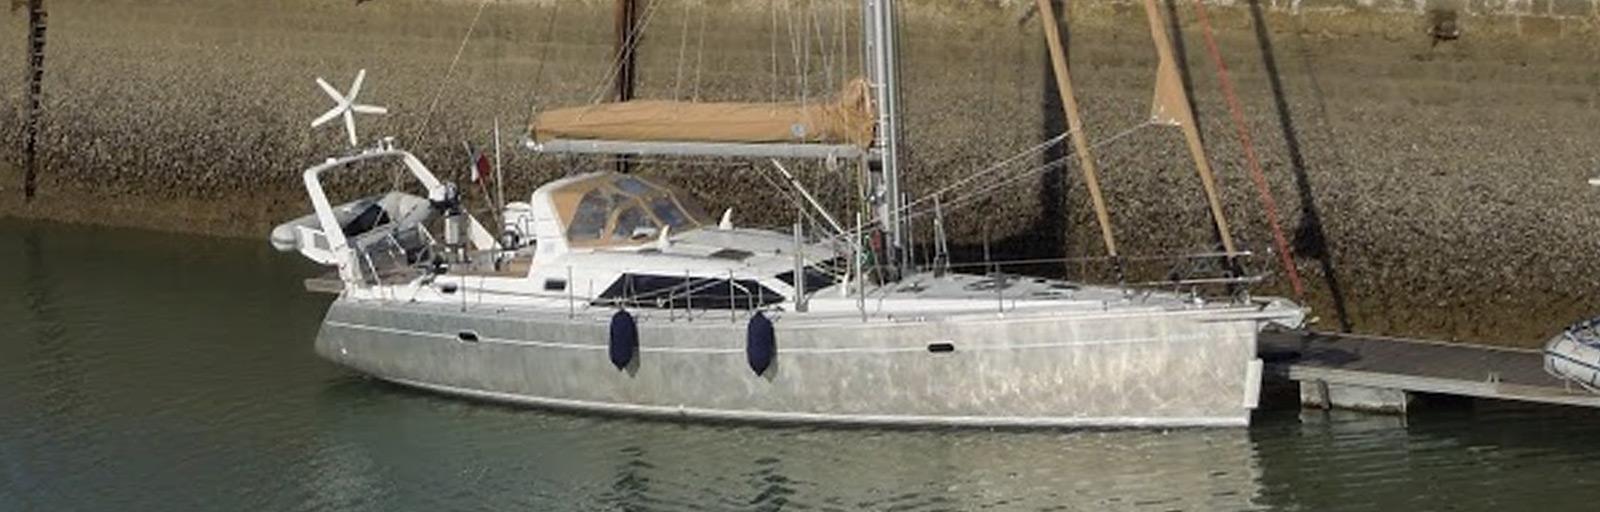 Alliage 45 - AYC Yachtbroker